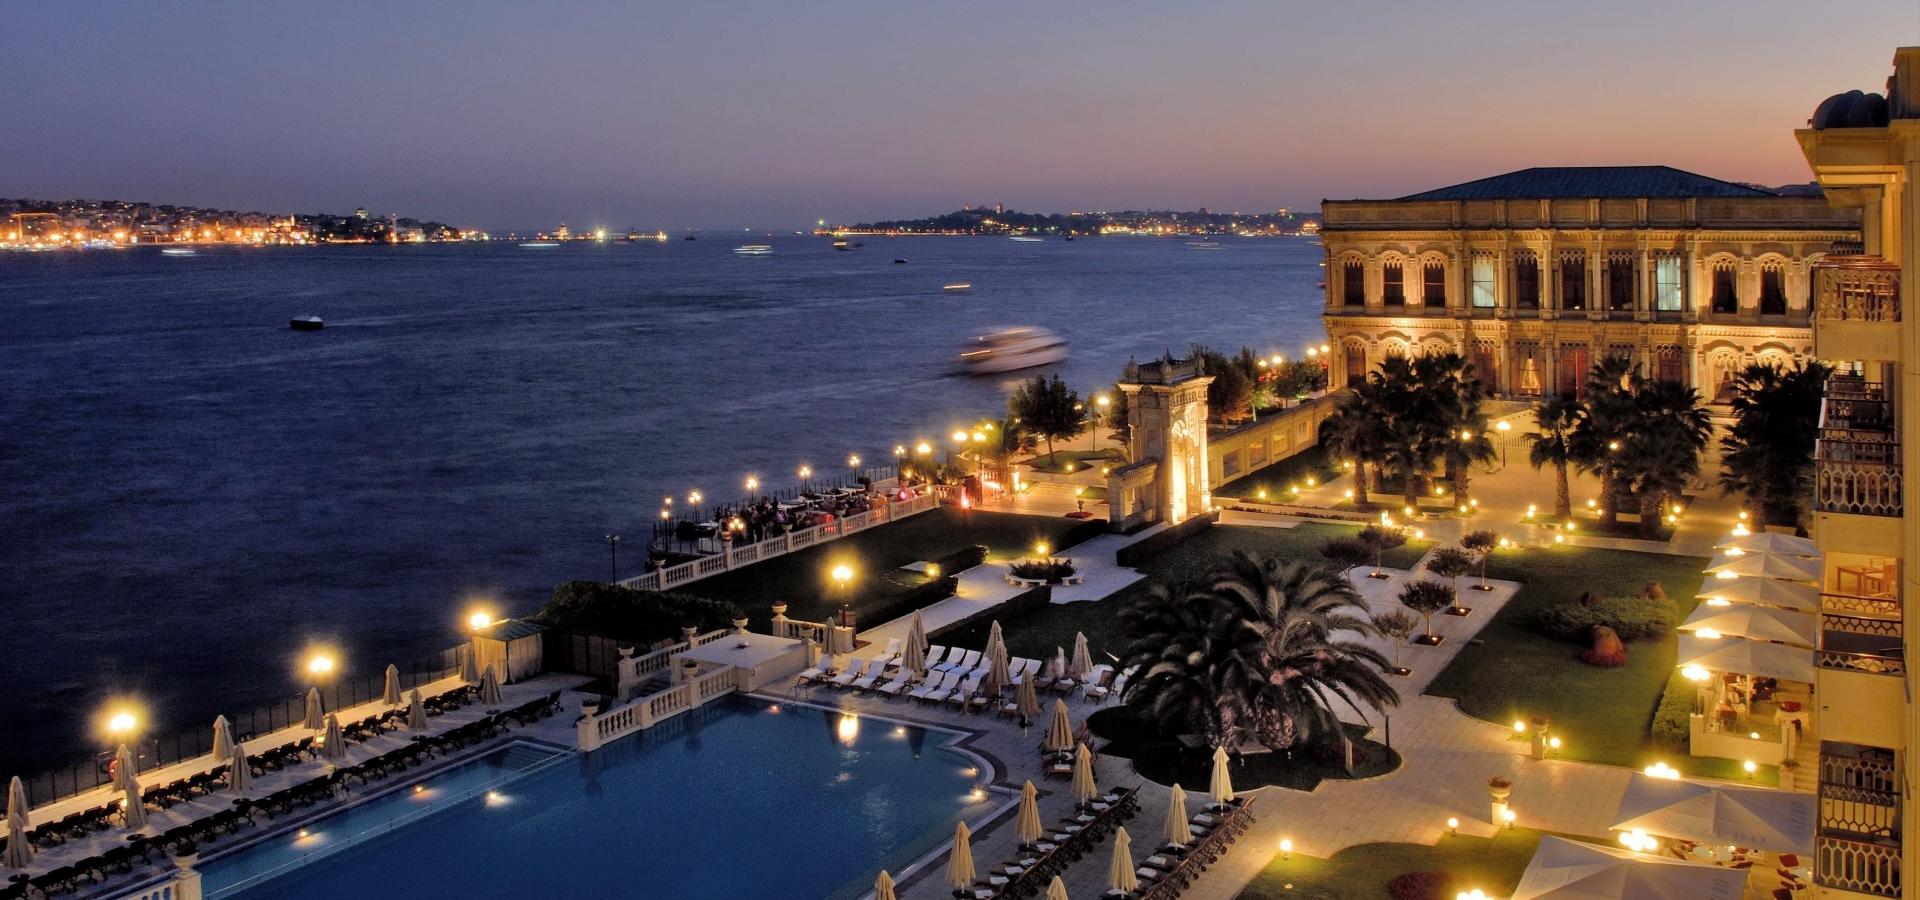 Turquia - Escapada Romántica a Estambul